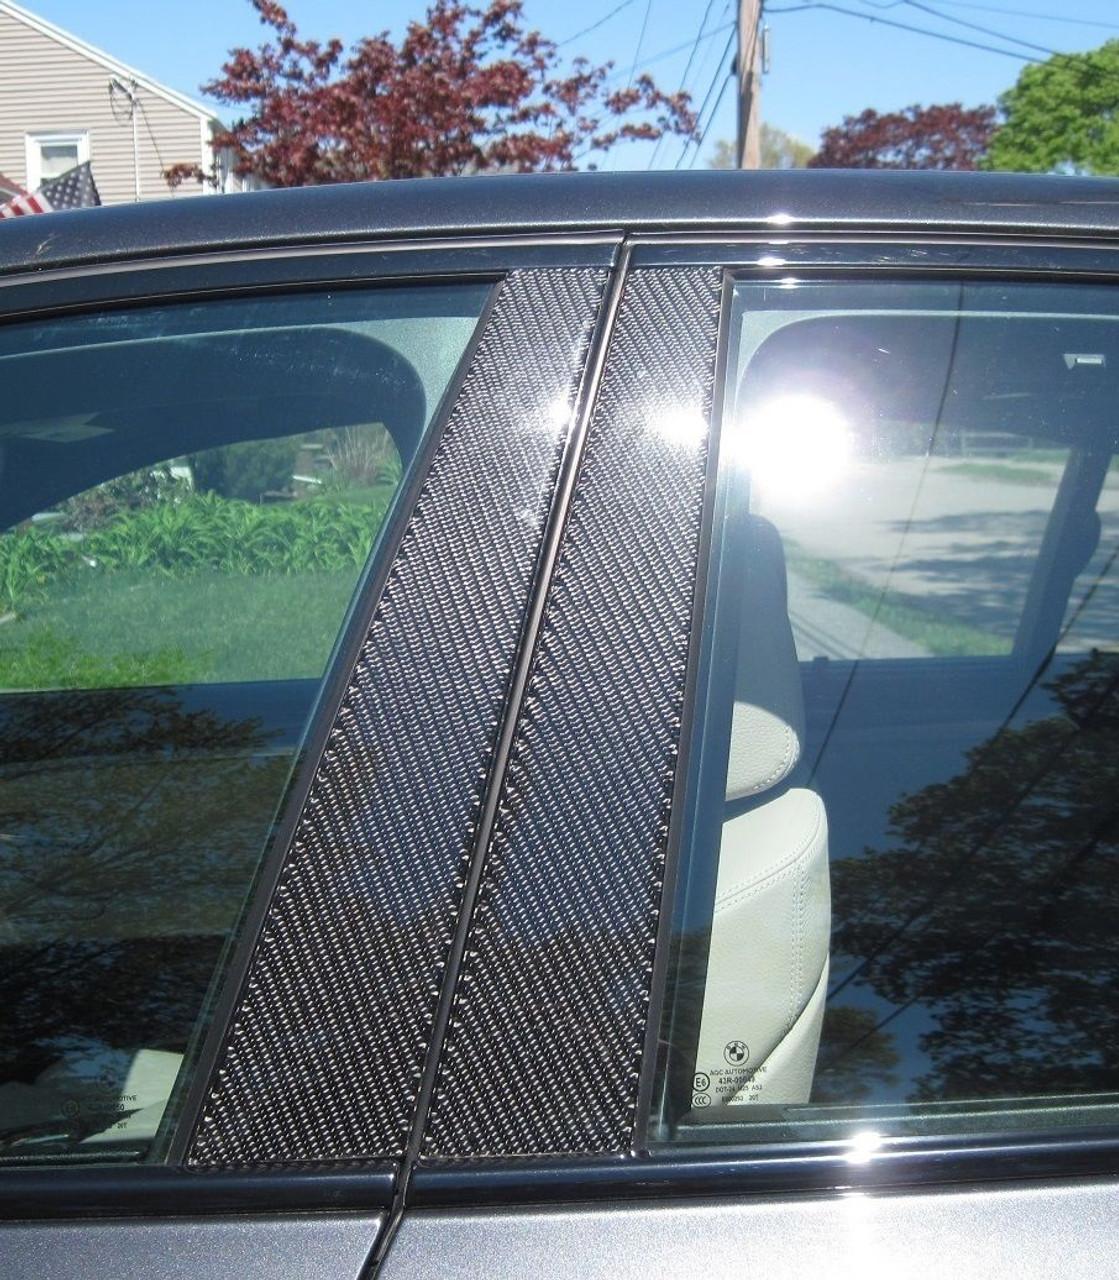 Stainless Chrome Pillar Posts 4PCS QAA Door Trim FOR Toyota Corolla 2009-2013